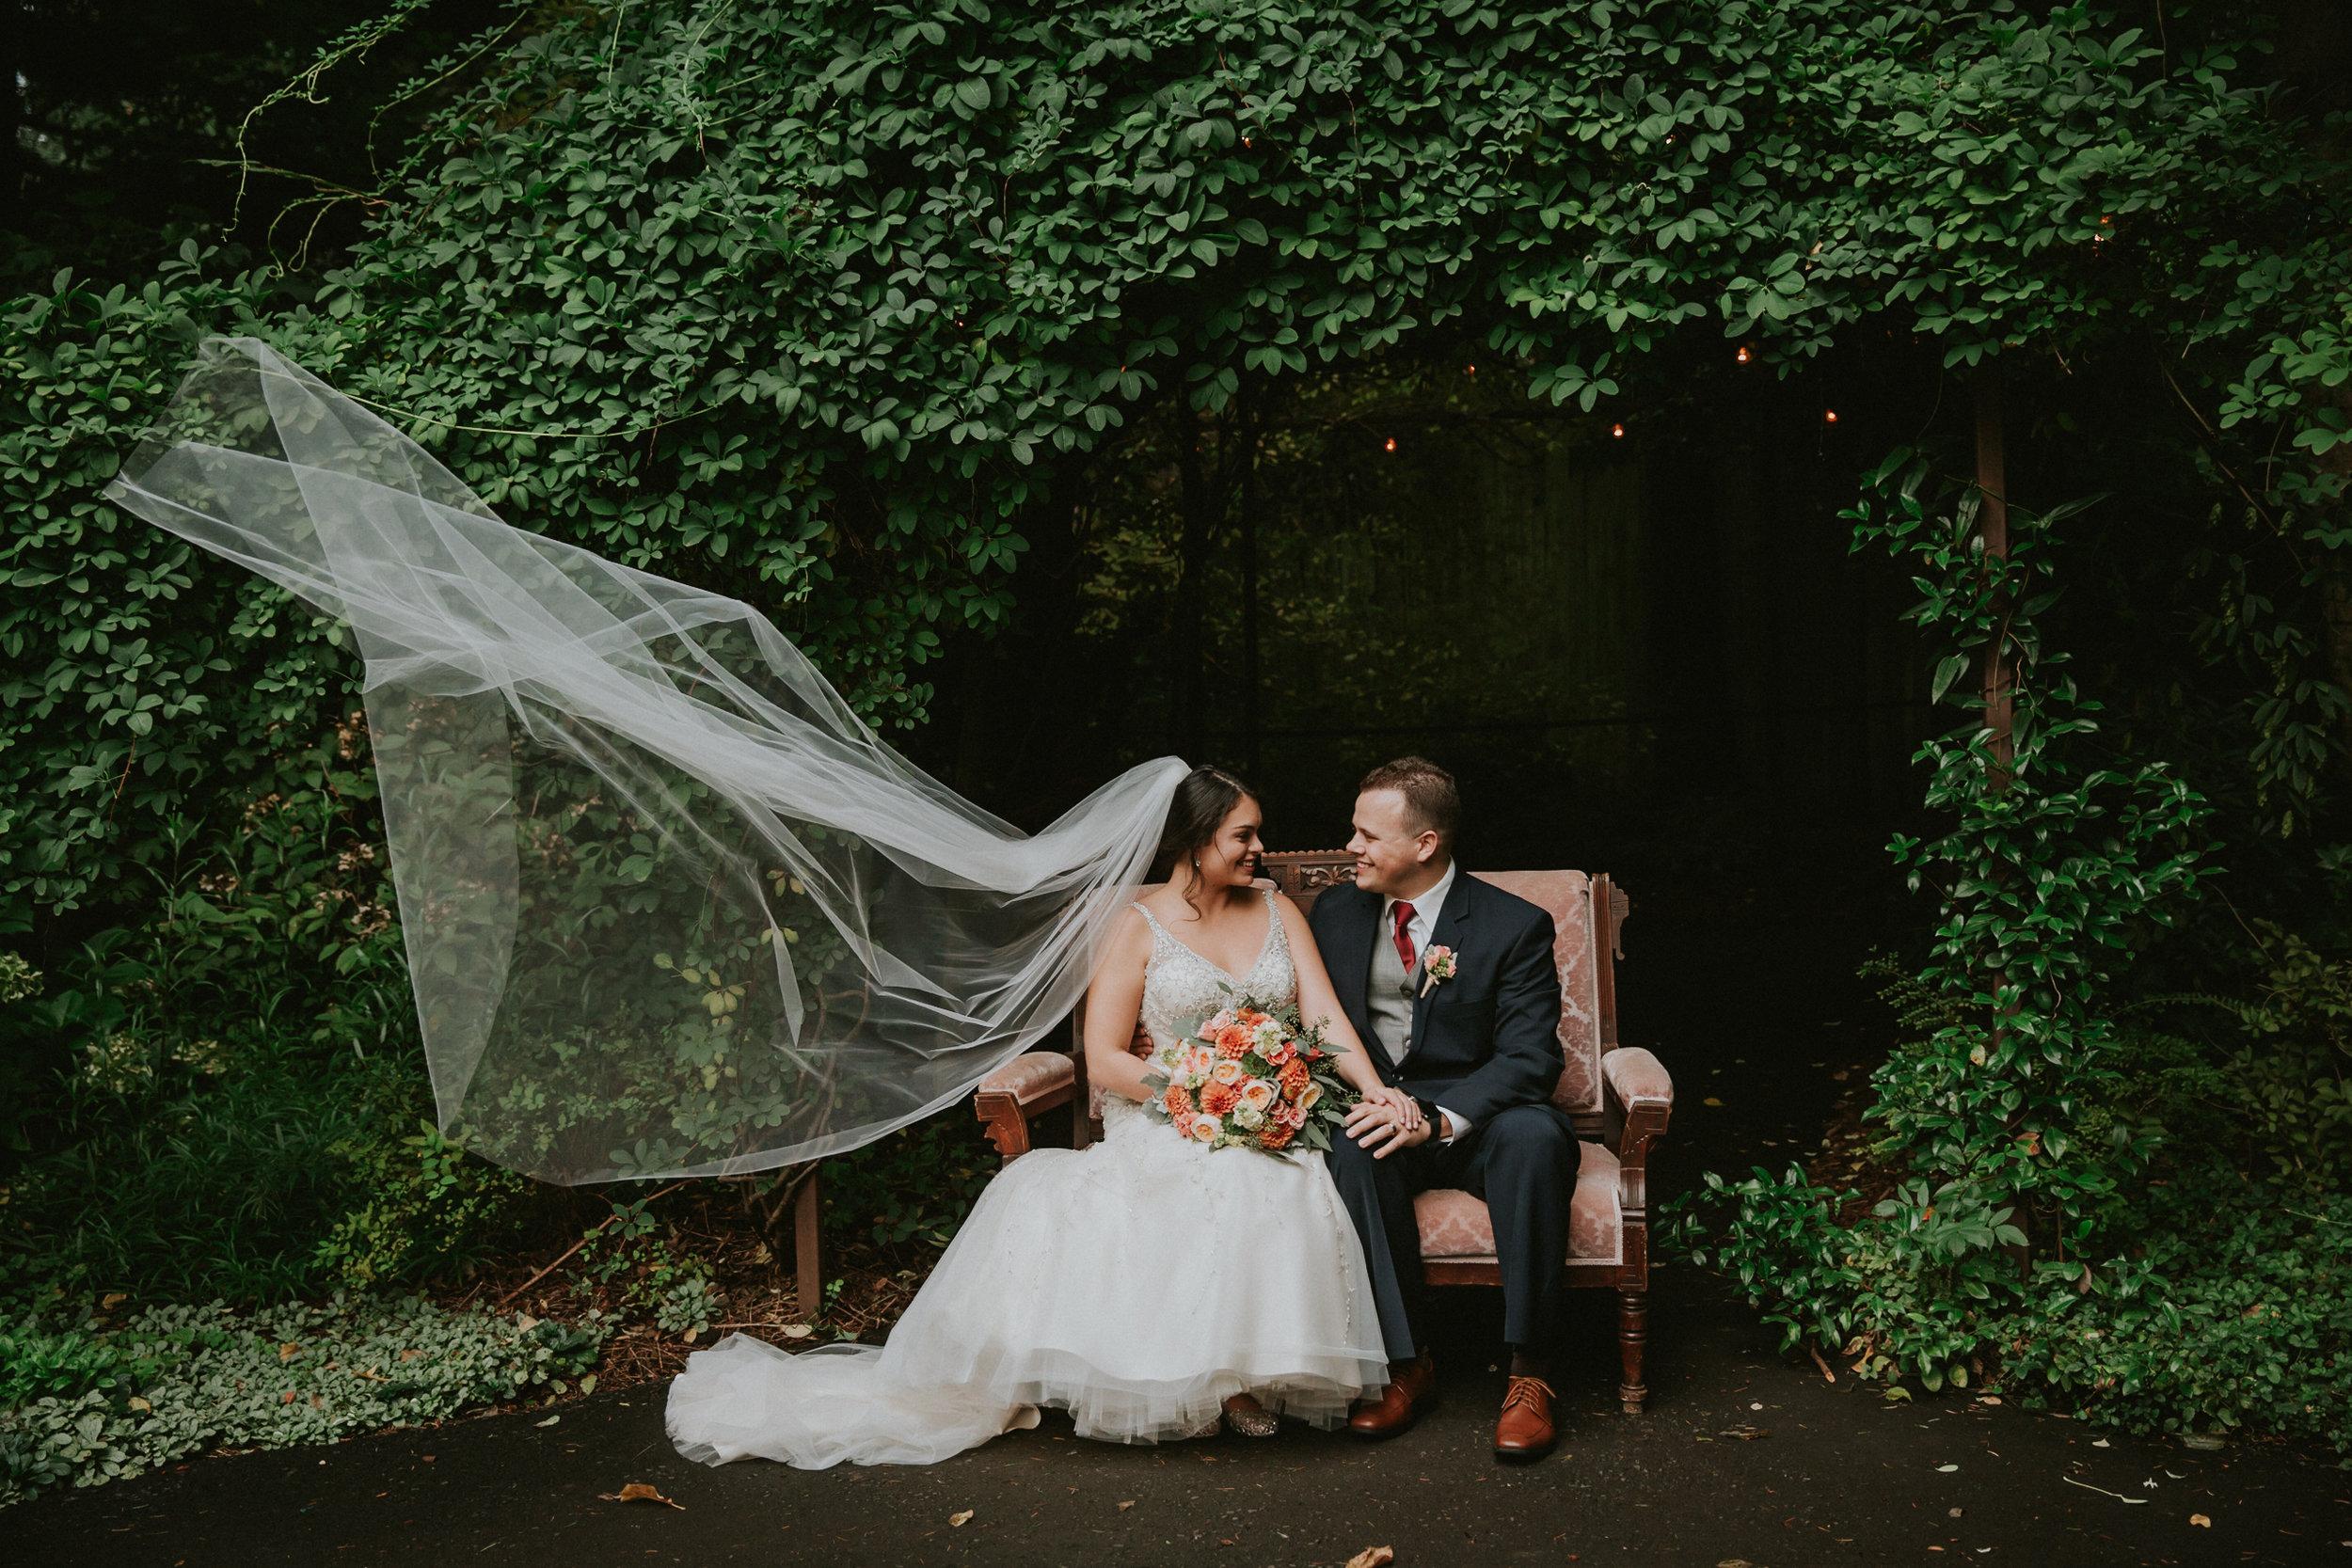 Portland_wedding_photographer_McMenamins_Alfred_Tang (2 of 6).jpg